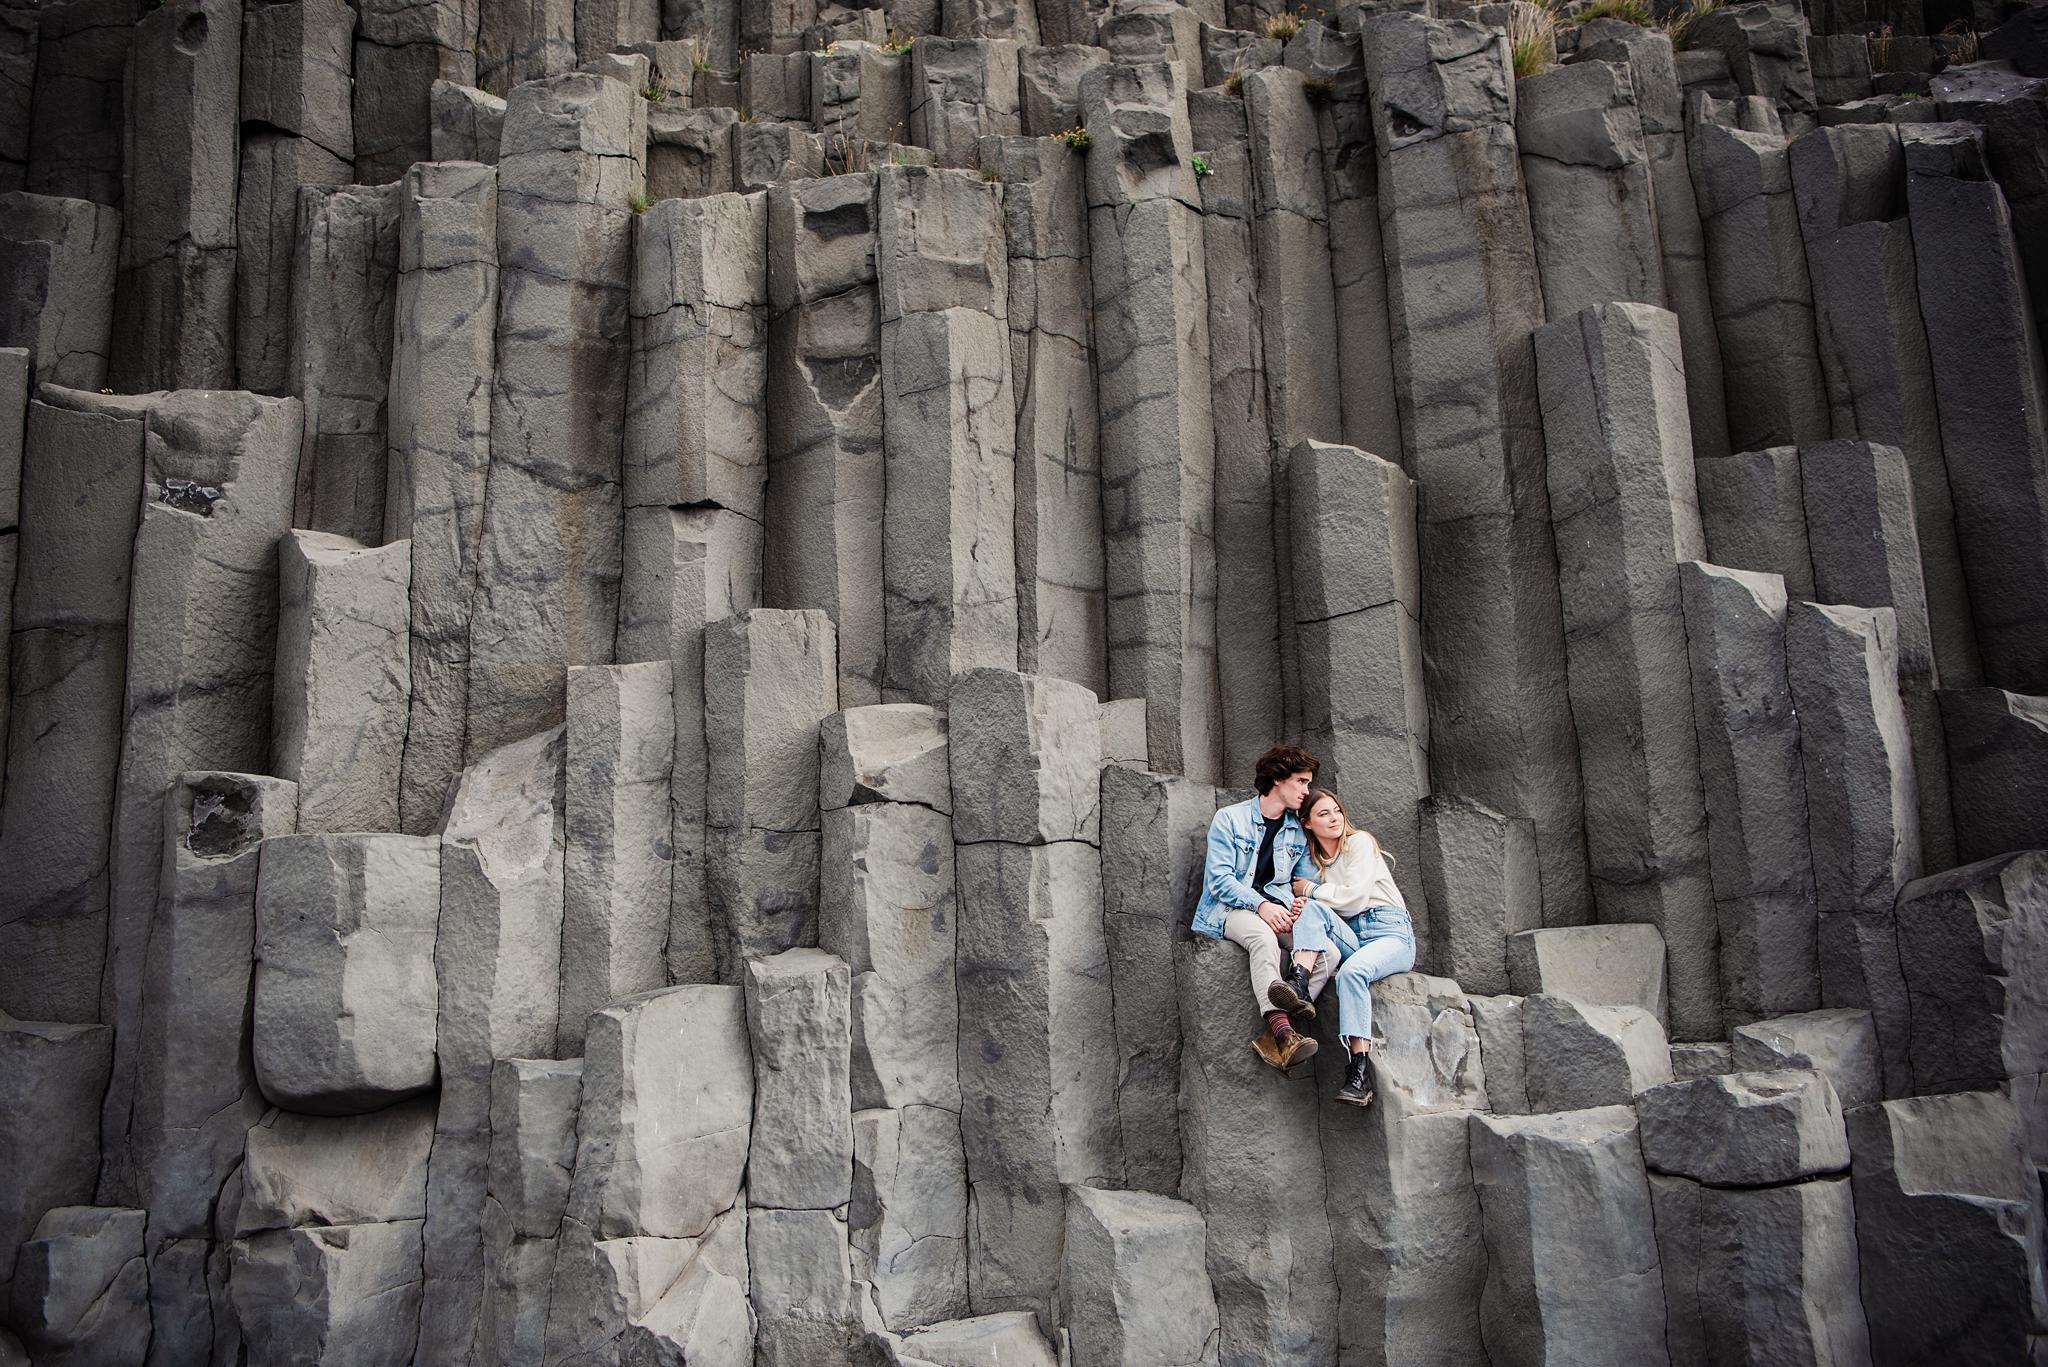 Iceland_Reynisfjara_Black_Sand_Beach_Couples_Session_JILL_STUDIO_Rochester_NY_Photographer_DSC_9762.jpg